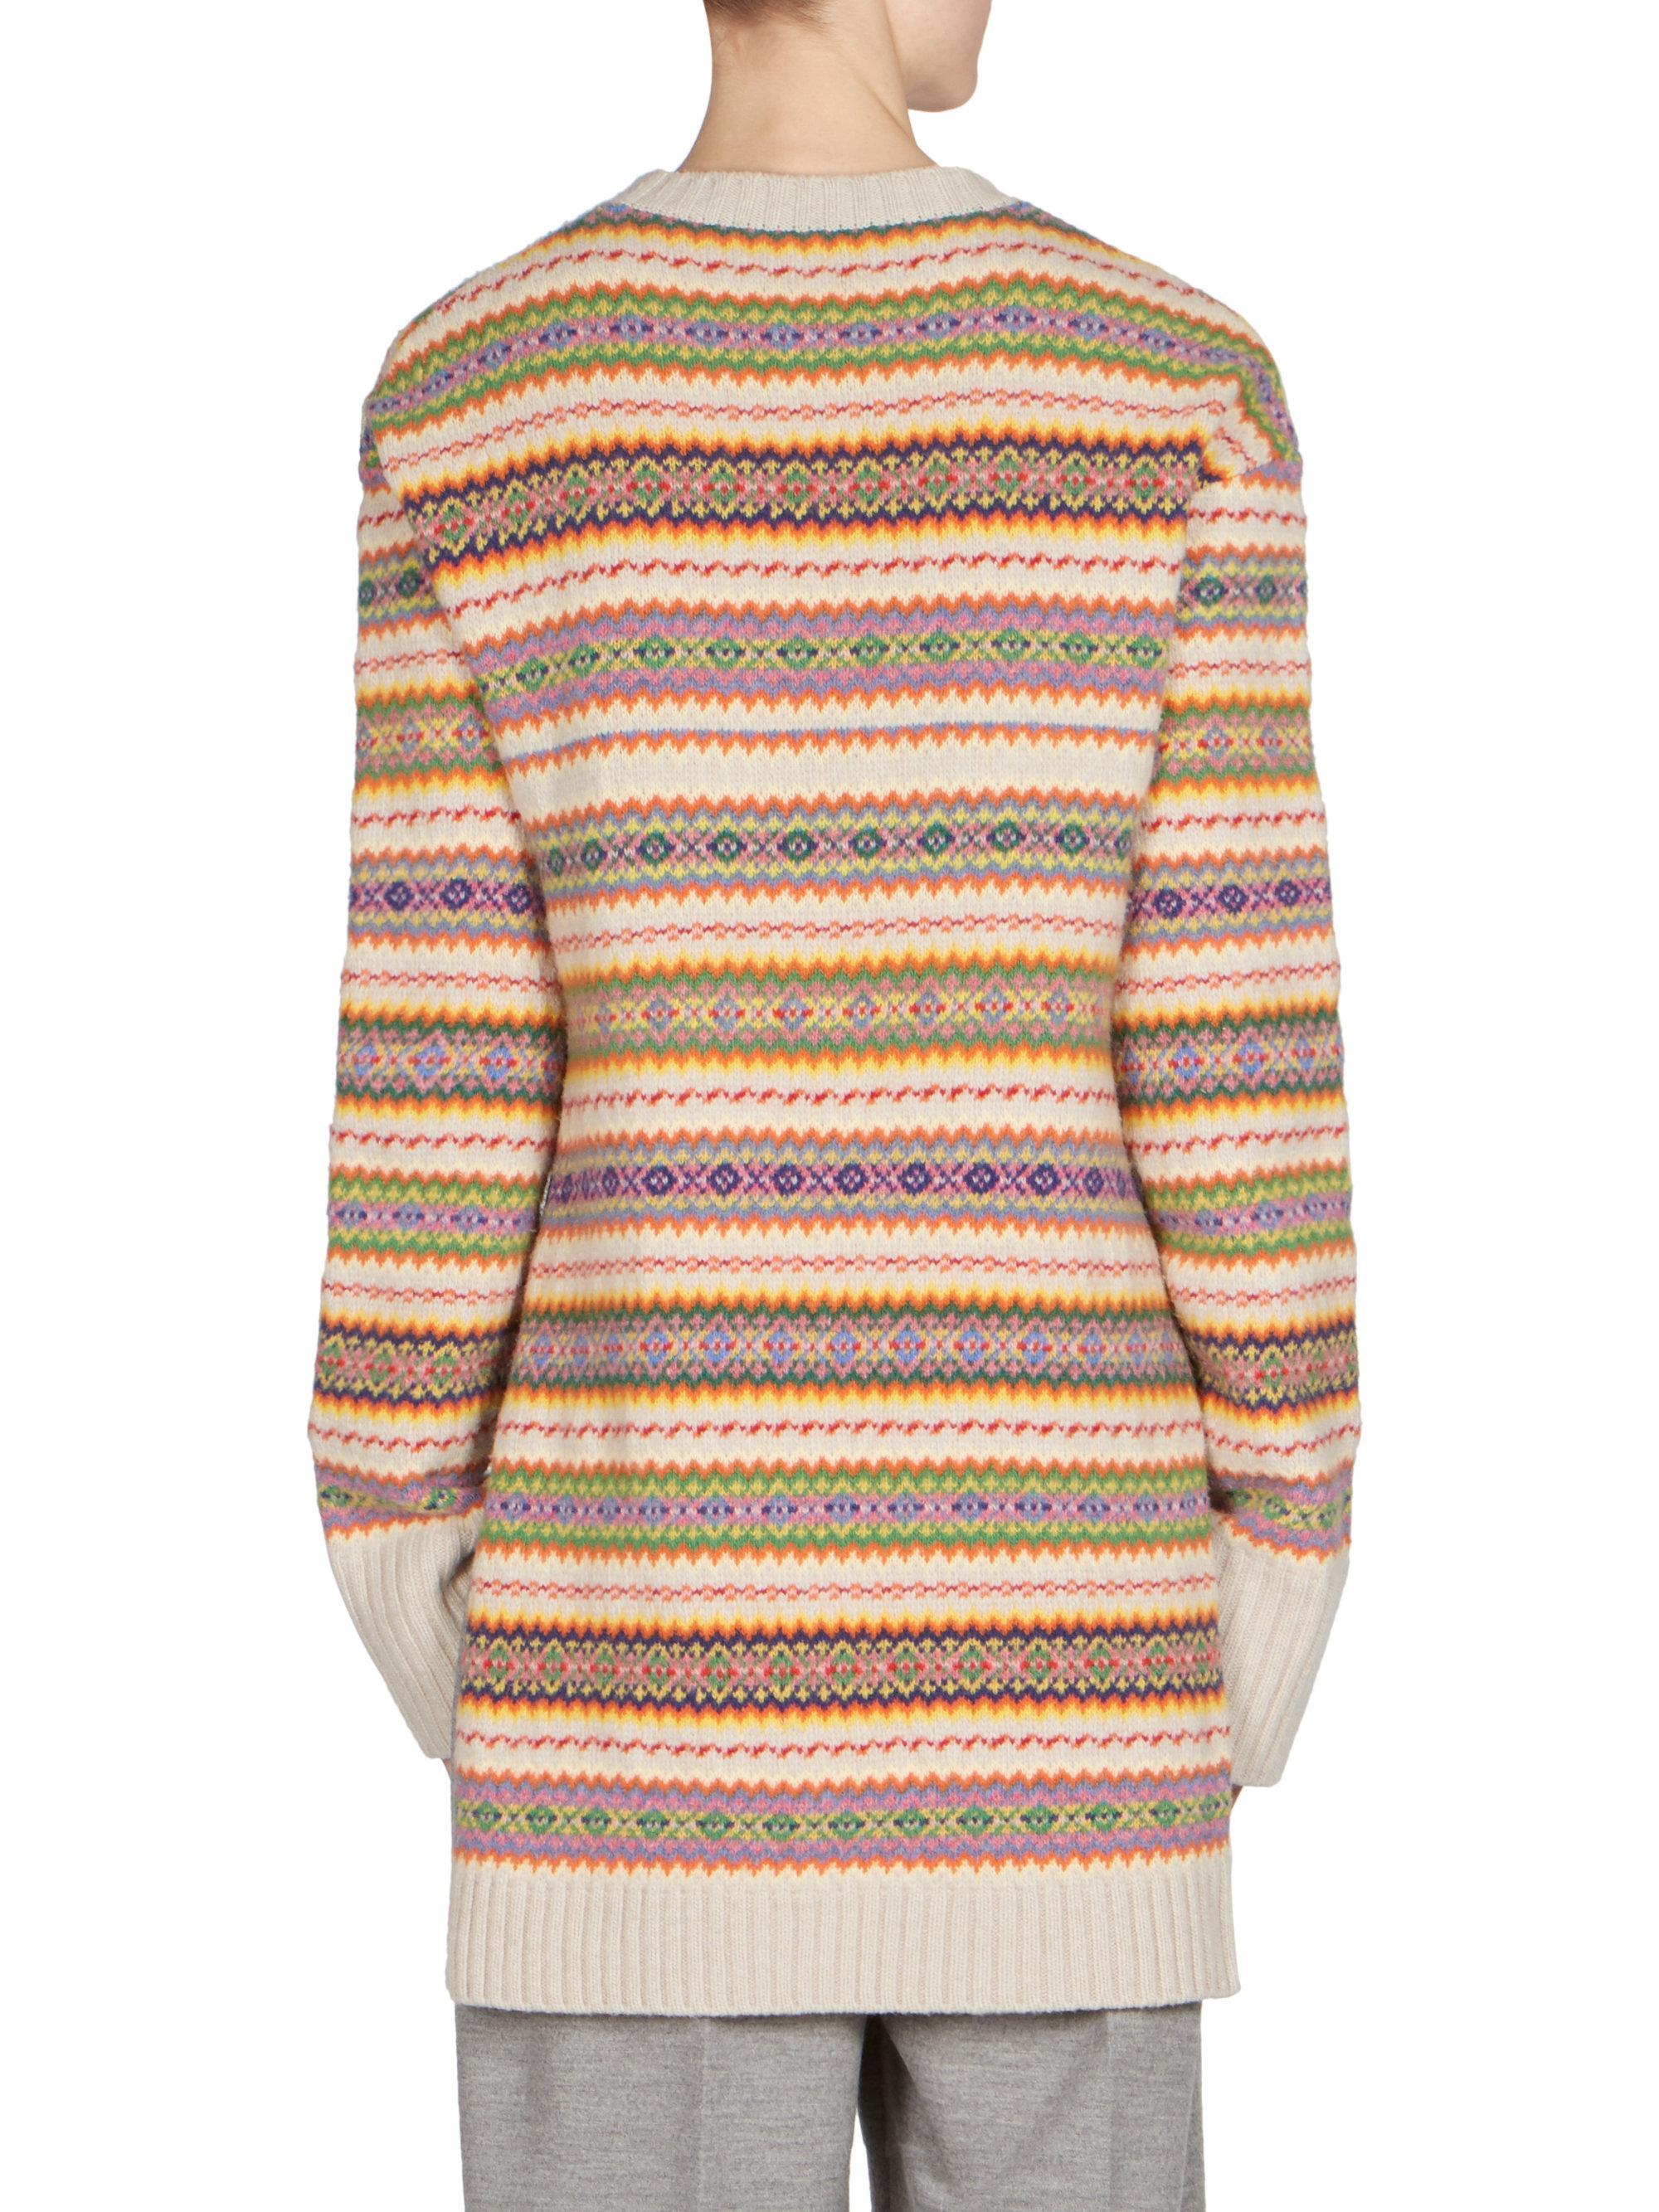 Stella mccartney Wool Fair Isle Sweater   Lyst